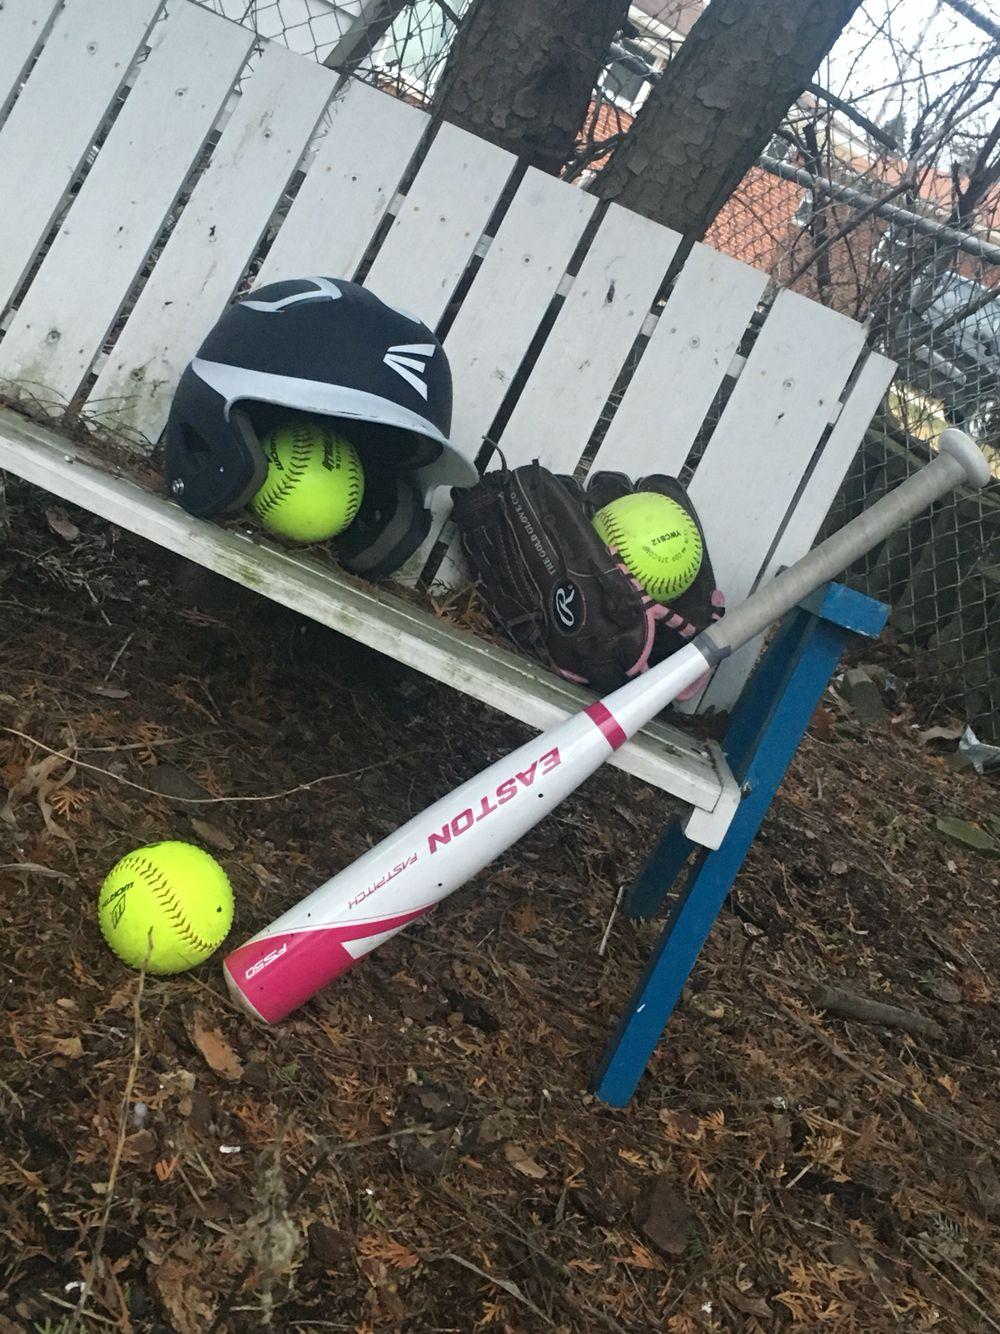 Gotta get the softballs